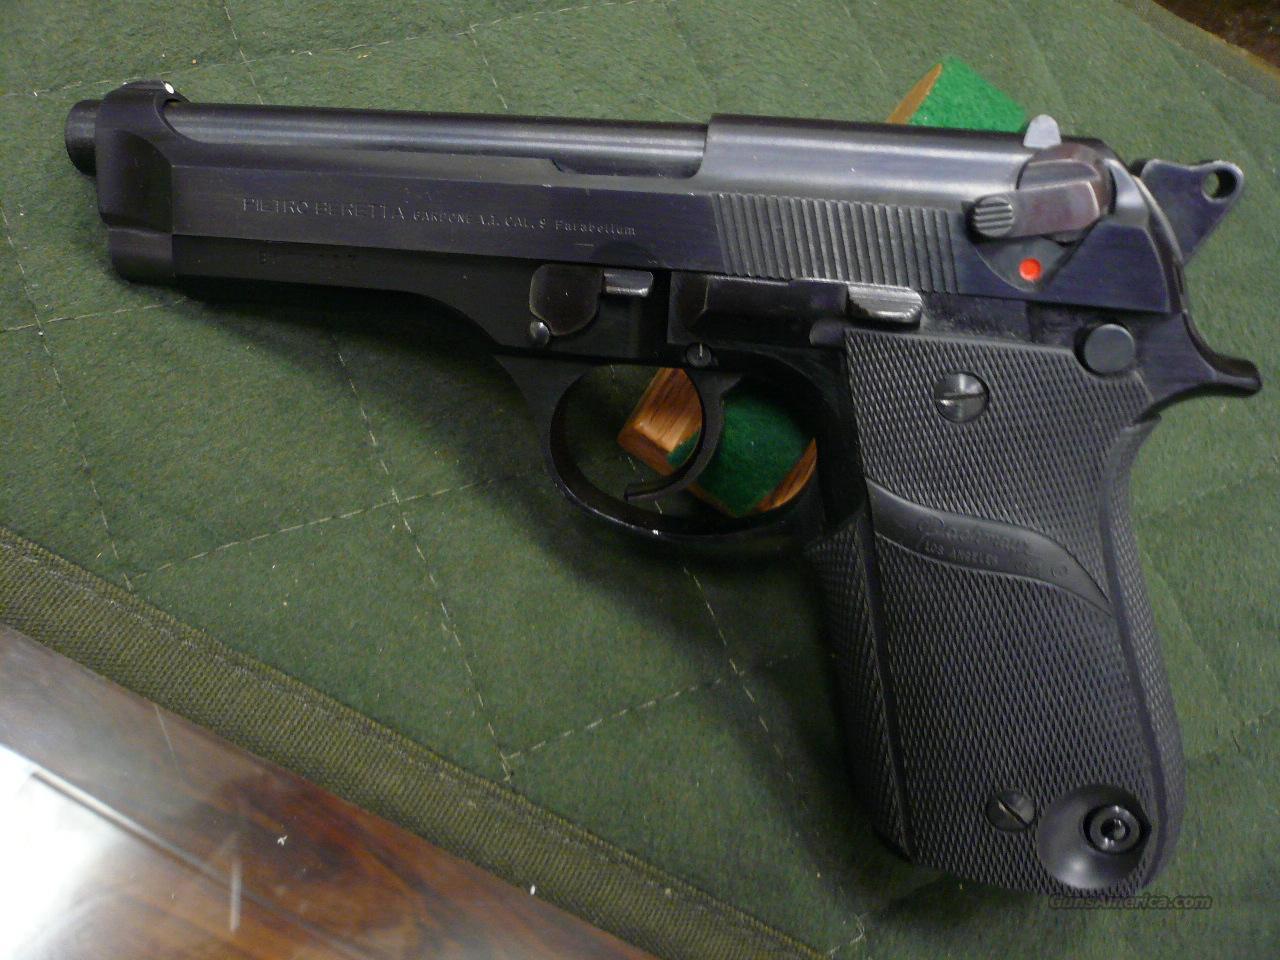 92S Early Model European mag release  Guns > Pistols > Beretta Pistols > Model 92 Series